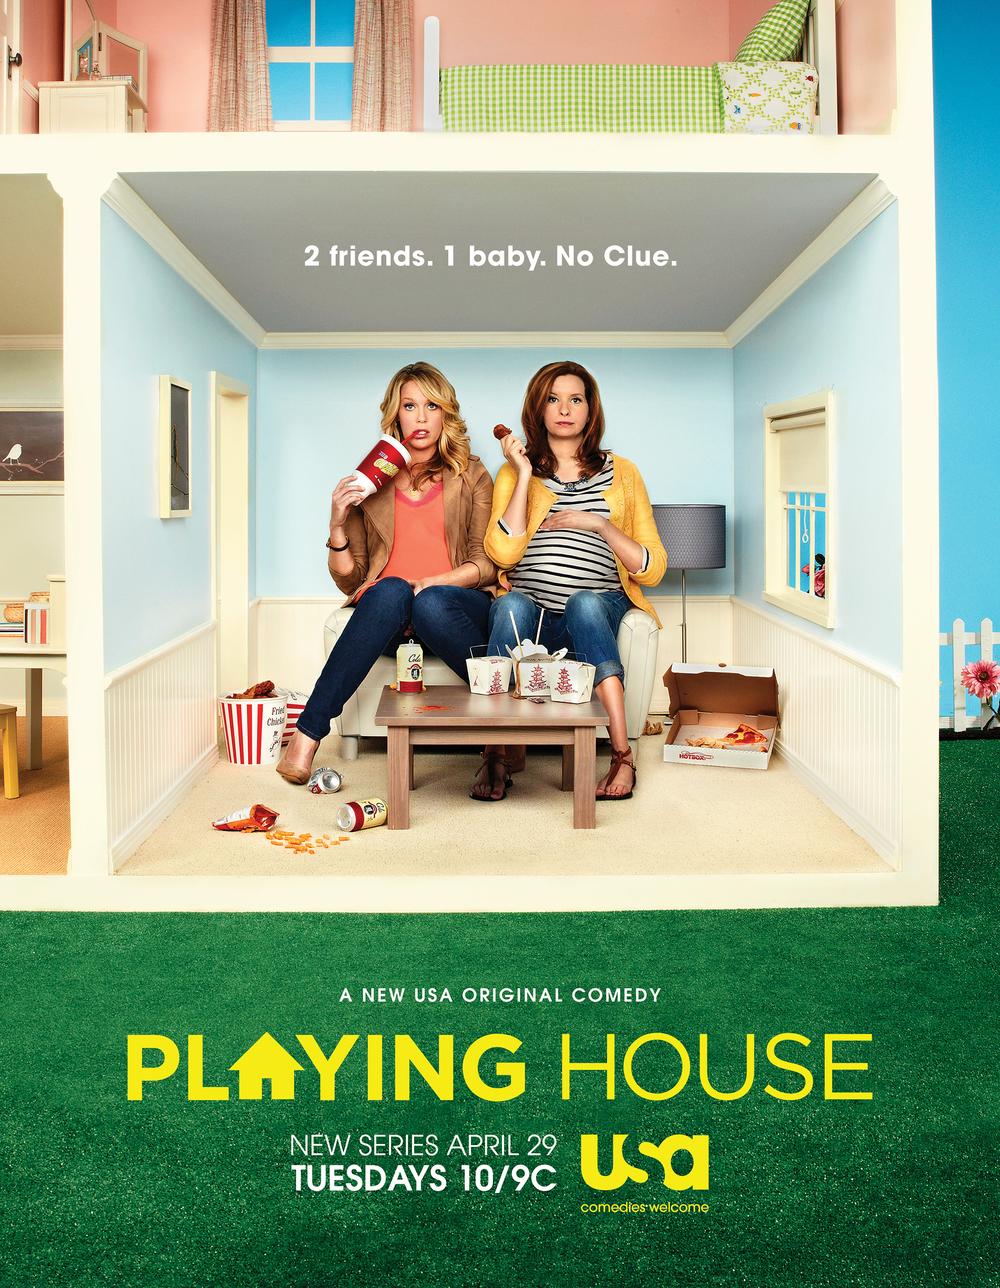 playinghouse.jpg